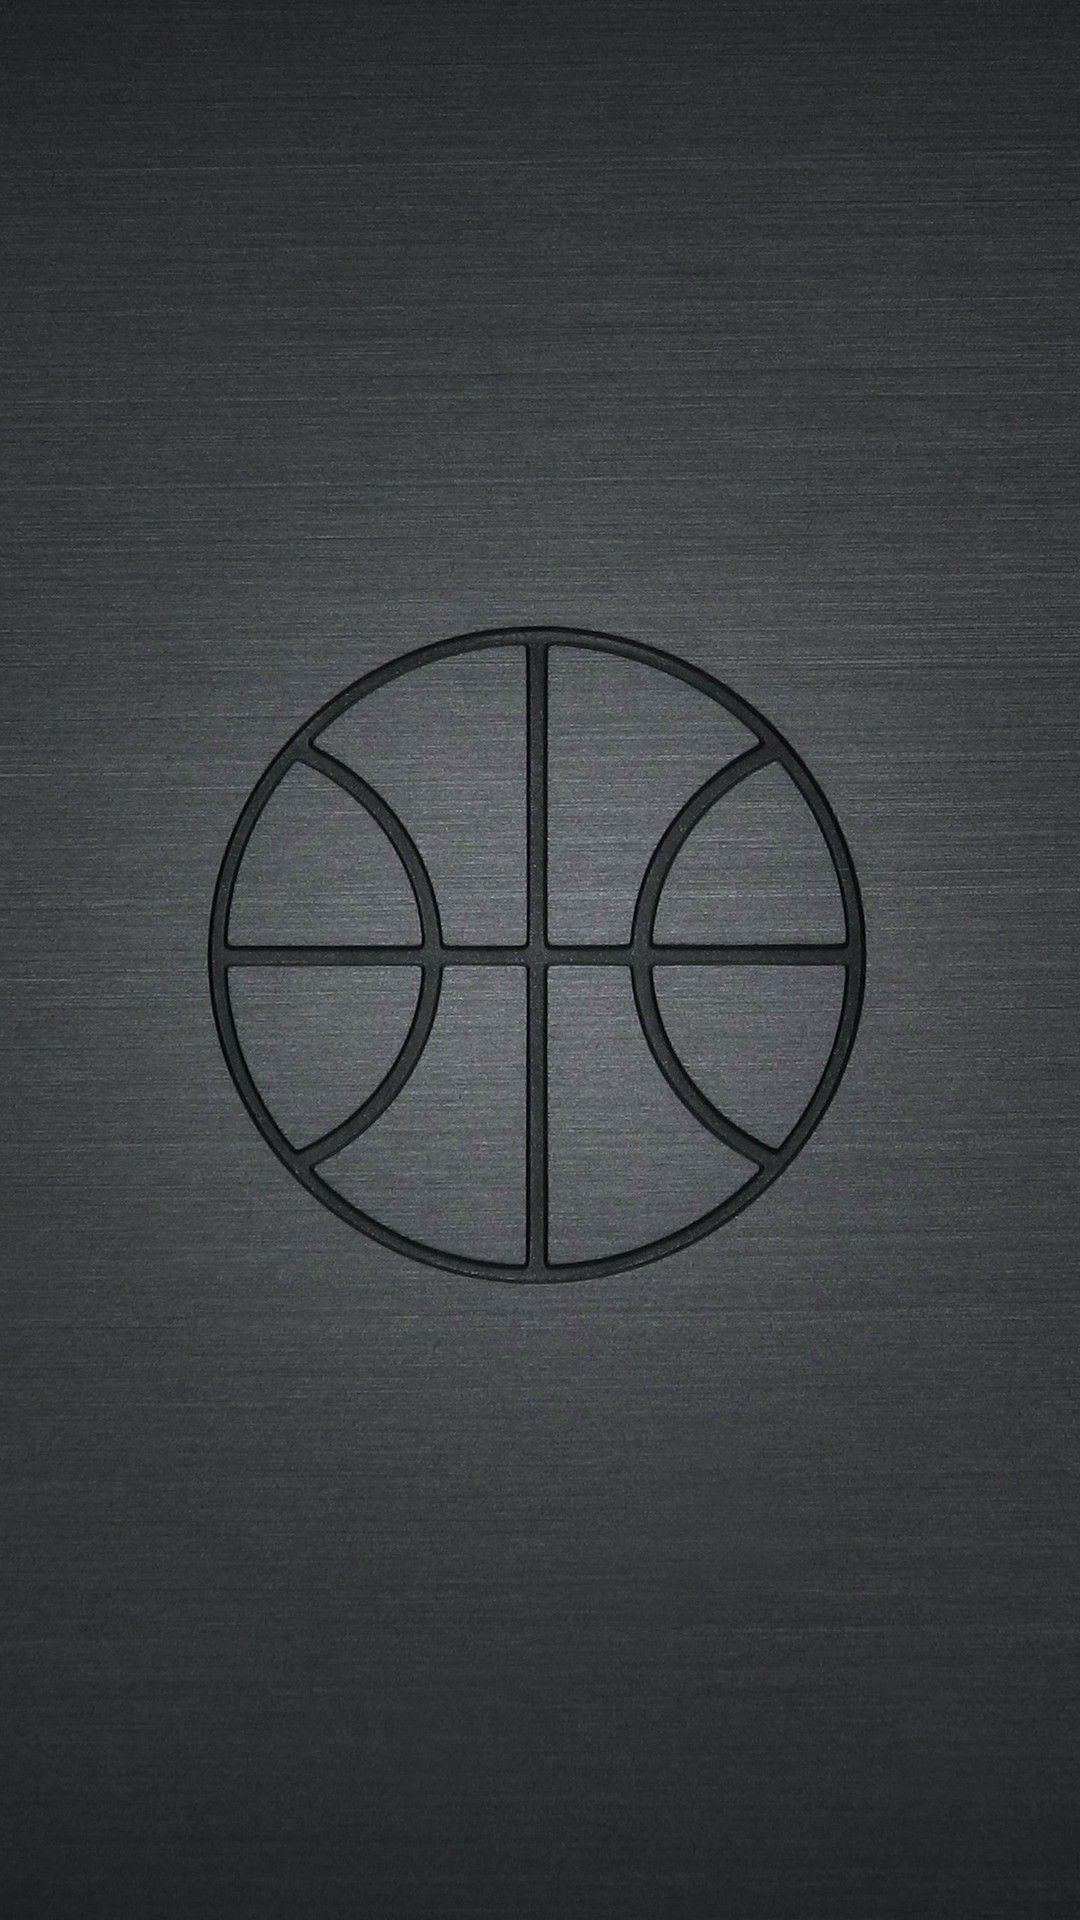 NBA Basketball iPhone 7 Wallpaper Nba wallpapers